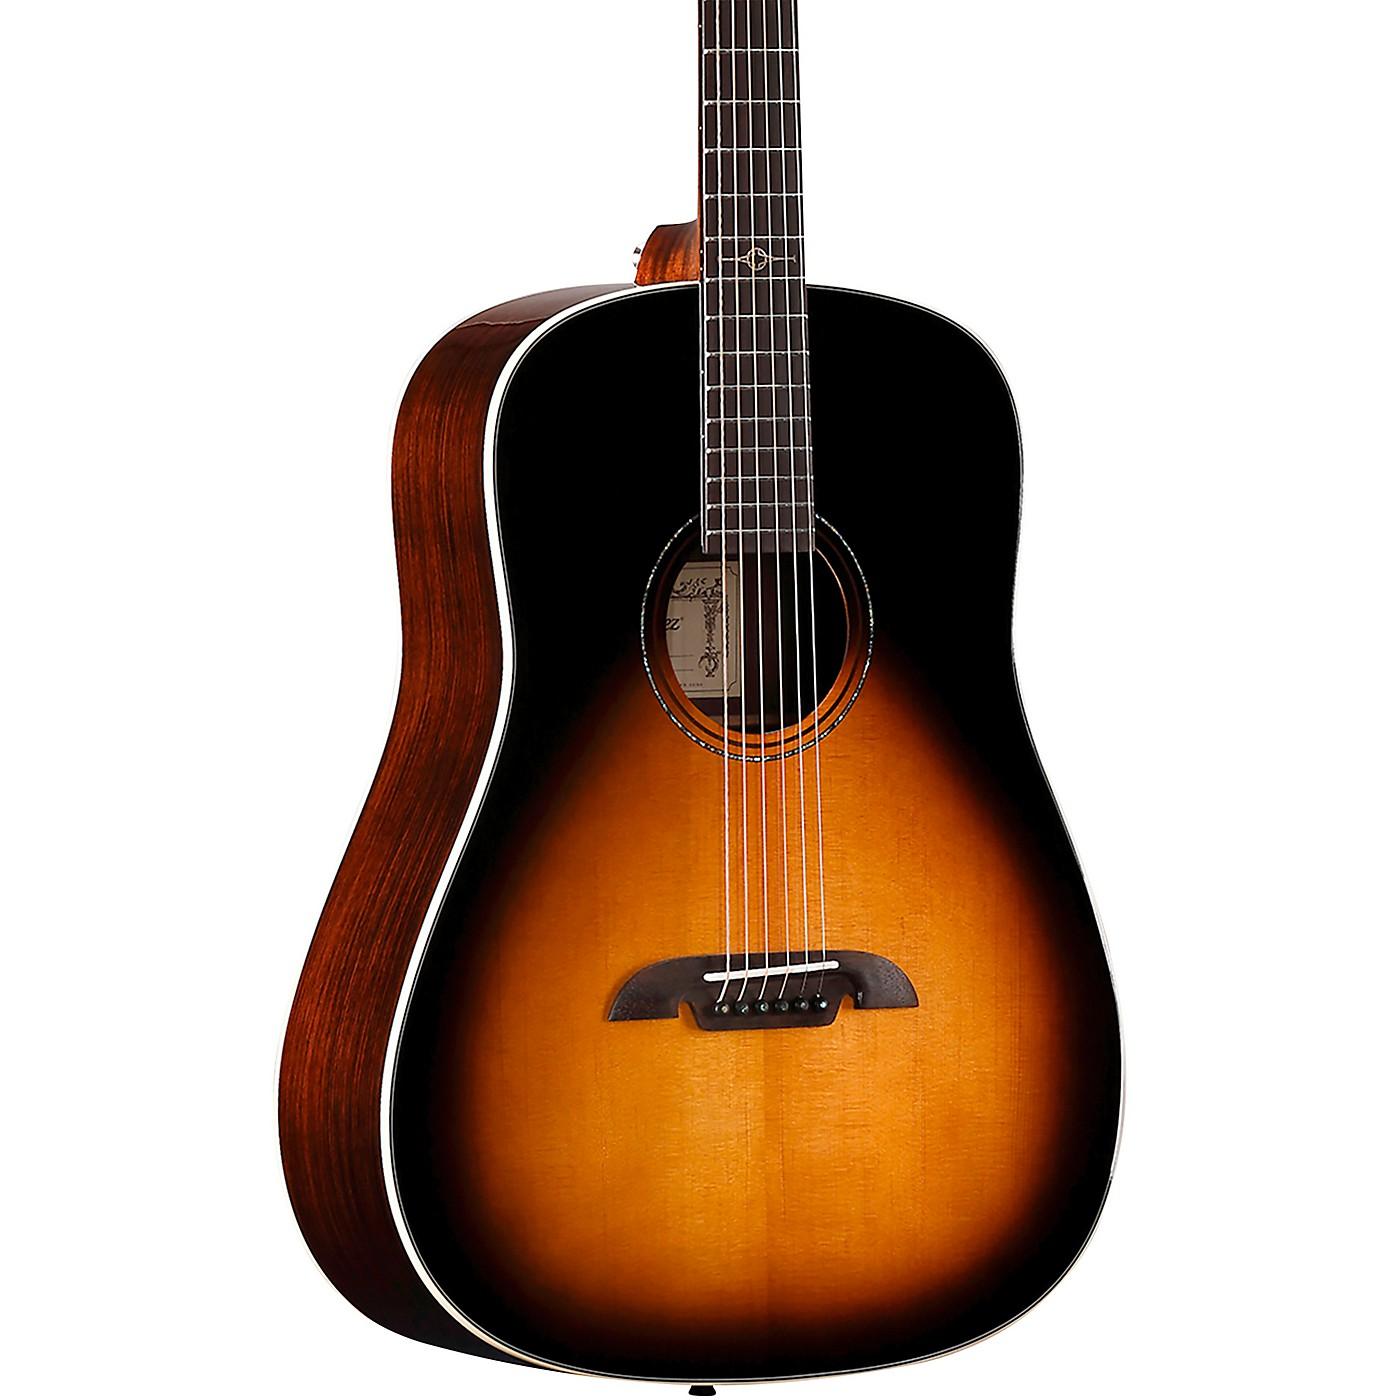 Alvarez MD70 Masterworks Dreadnought Acoustic Guitar thumbnail